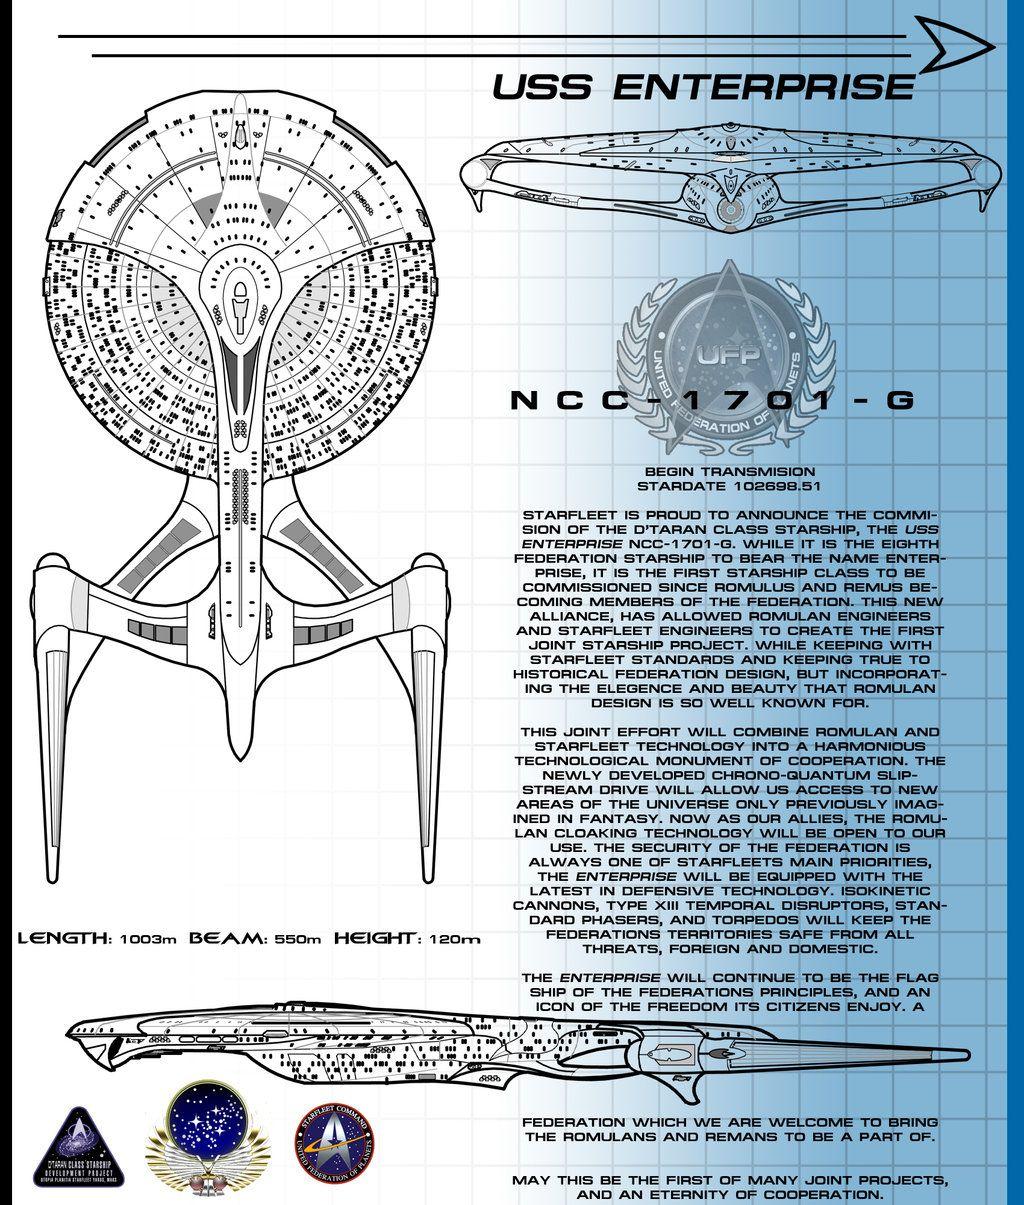 U.S.S. Enterprise NCC 1701 G by viantart